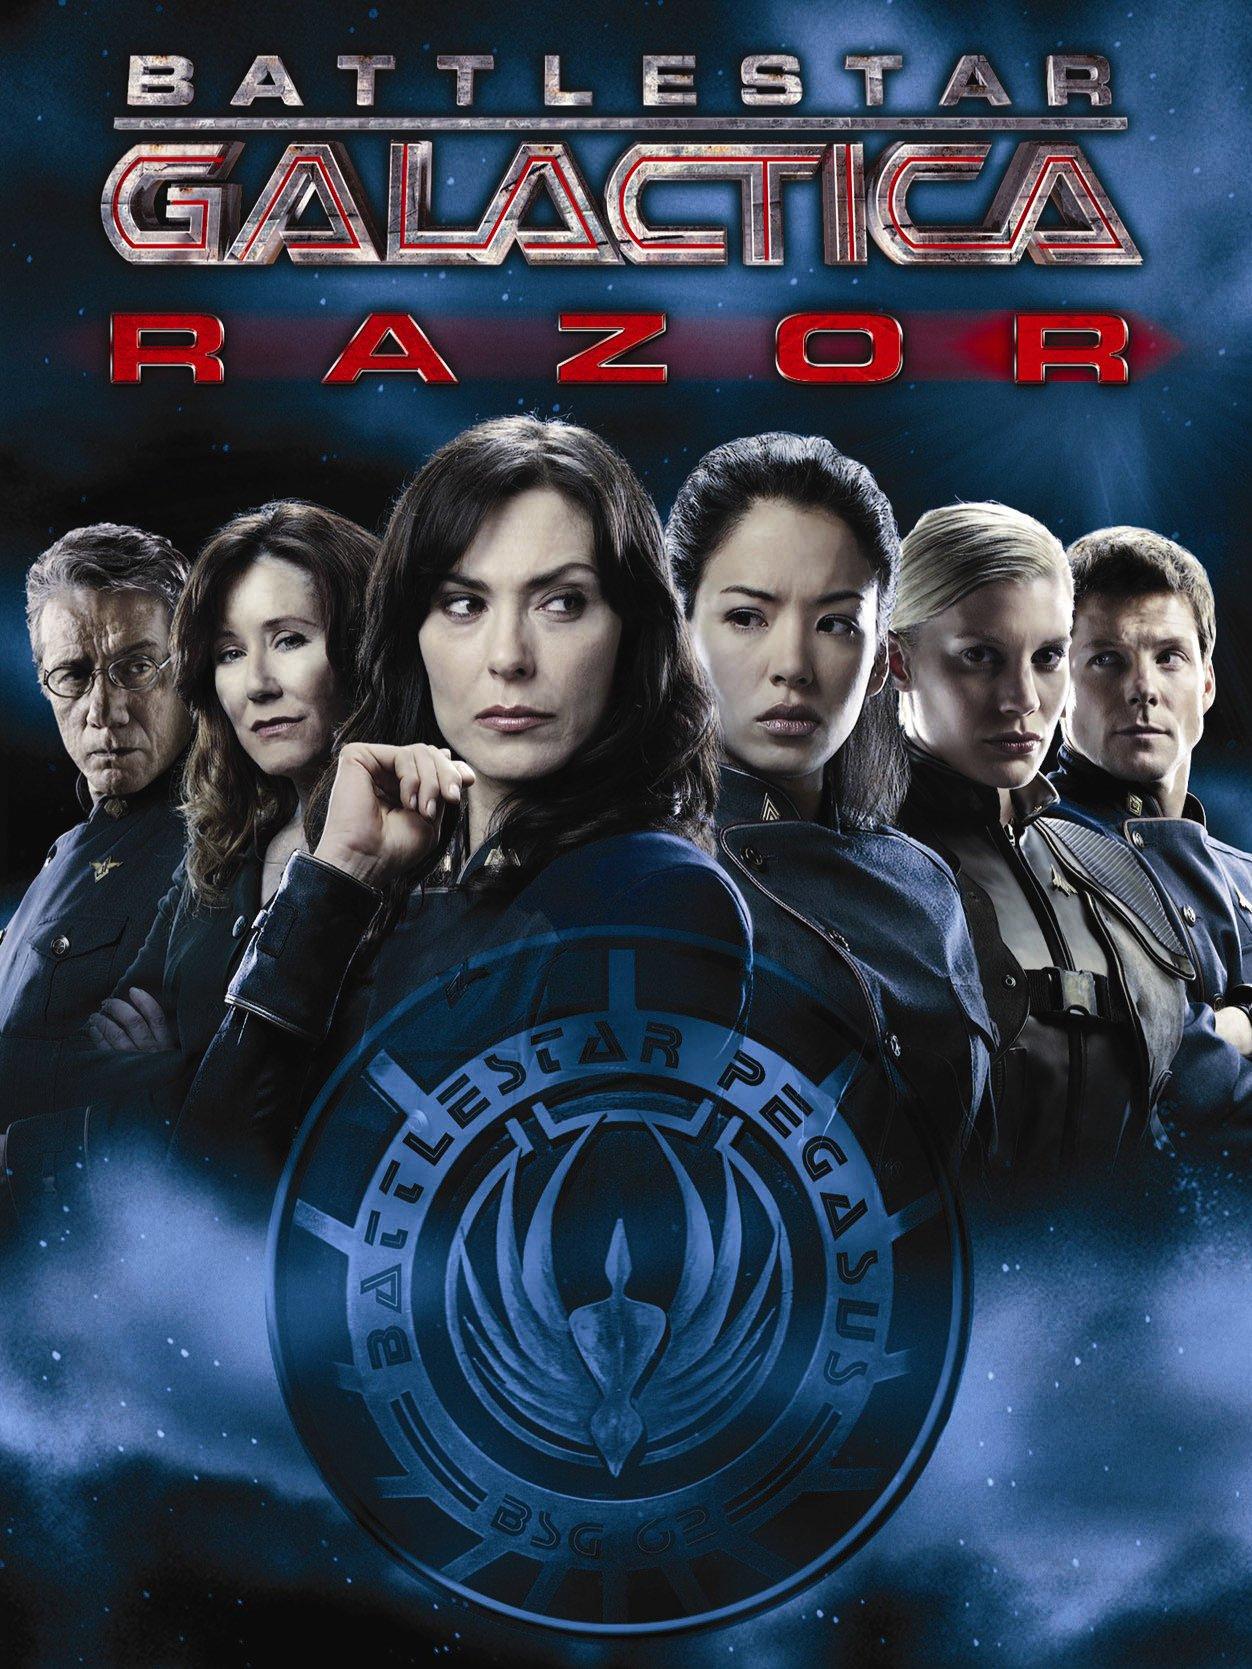 Amazon com: Battlestar Galactica: Razor - Unrated Extended